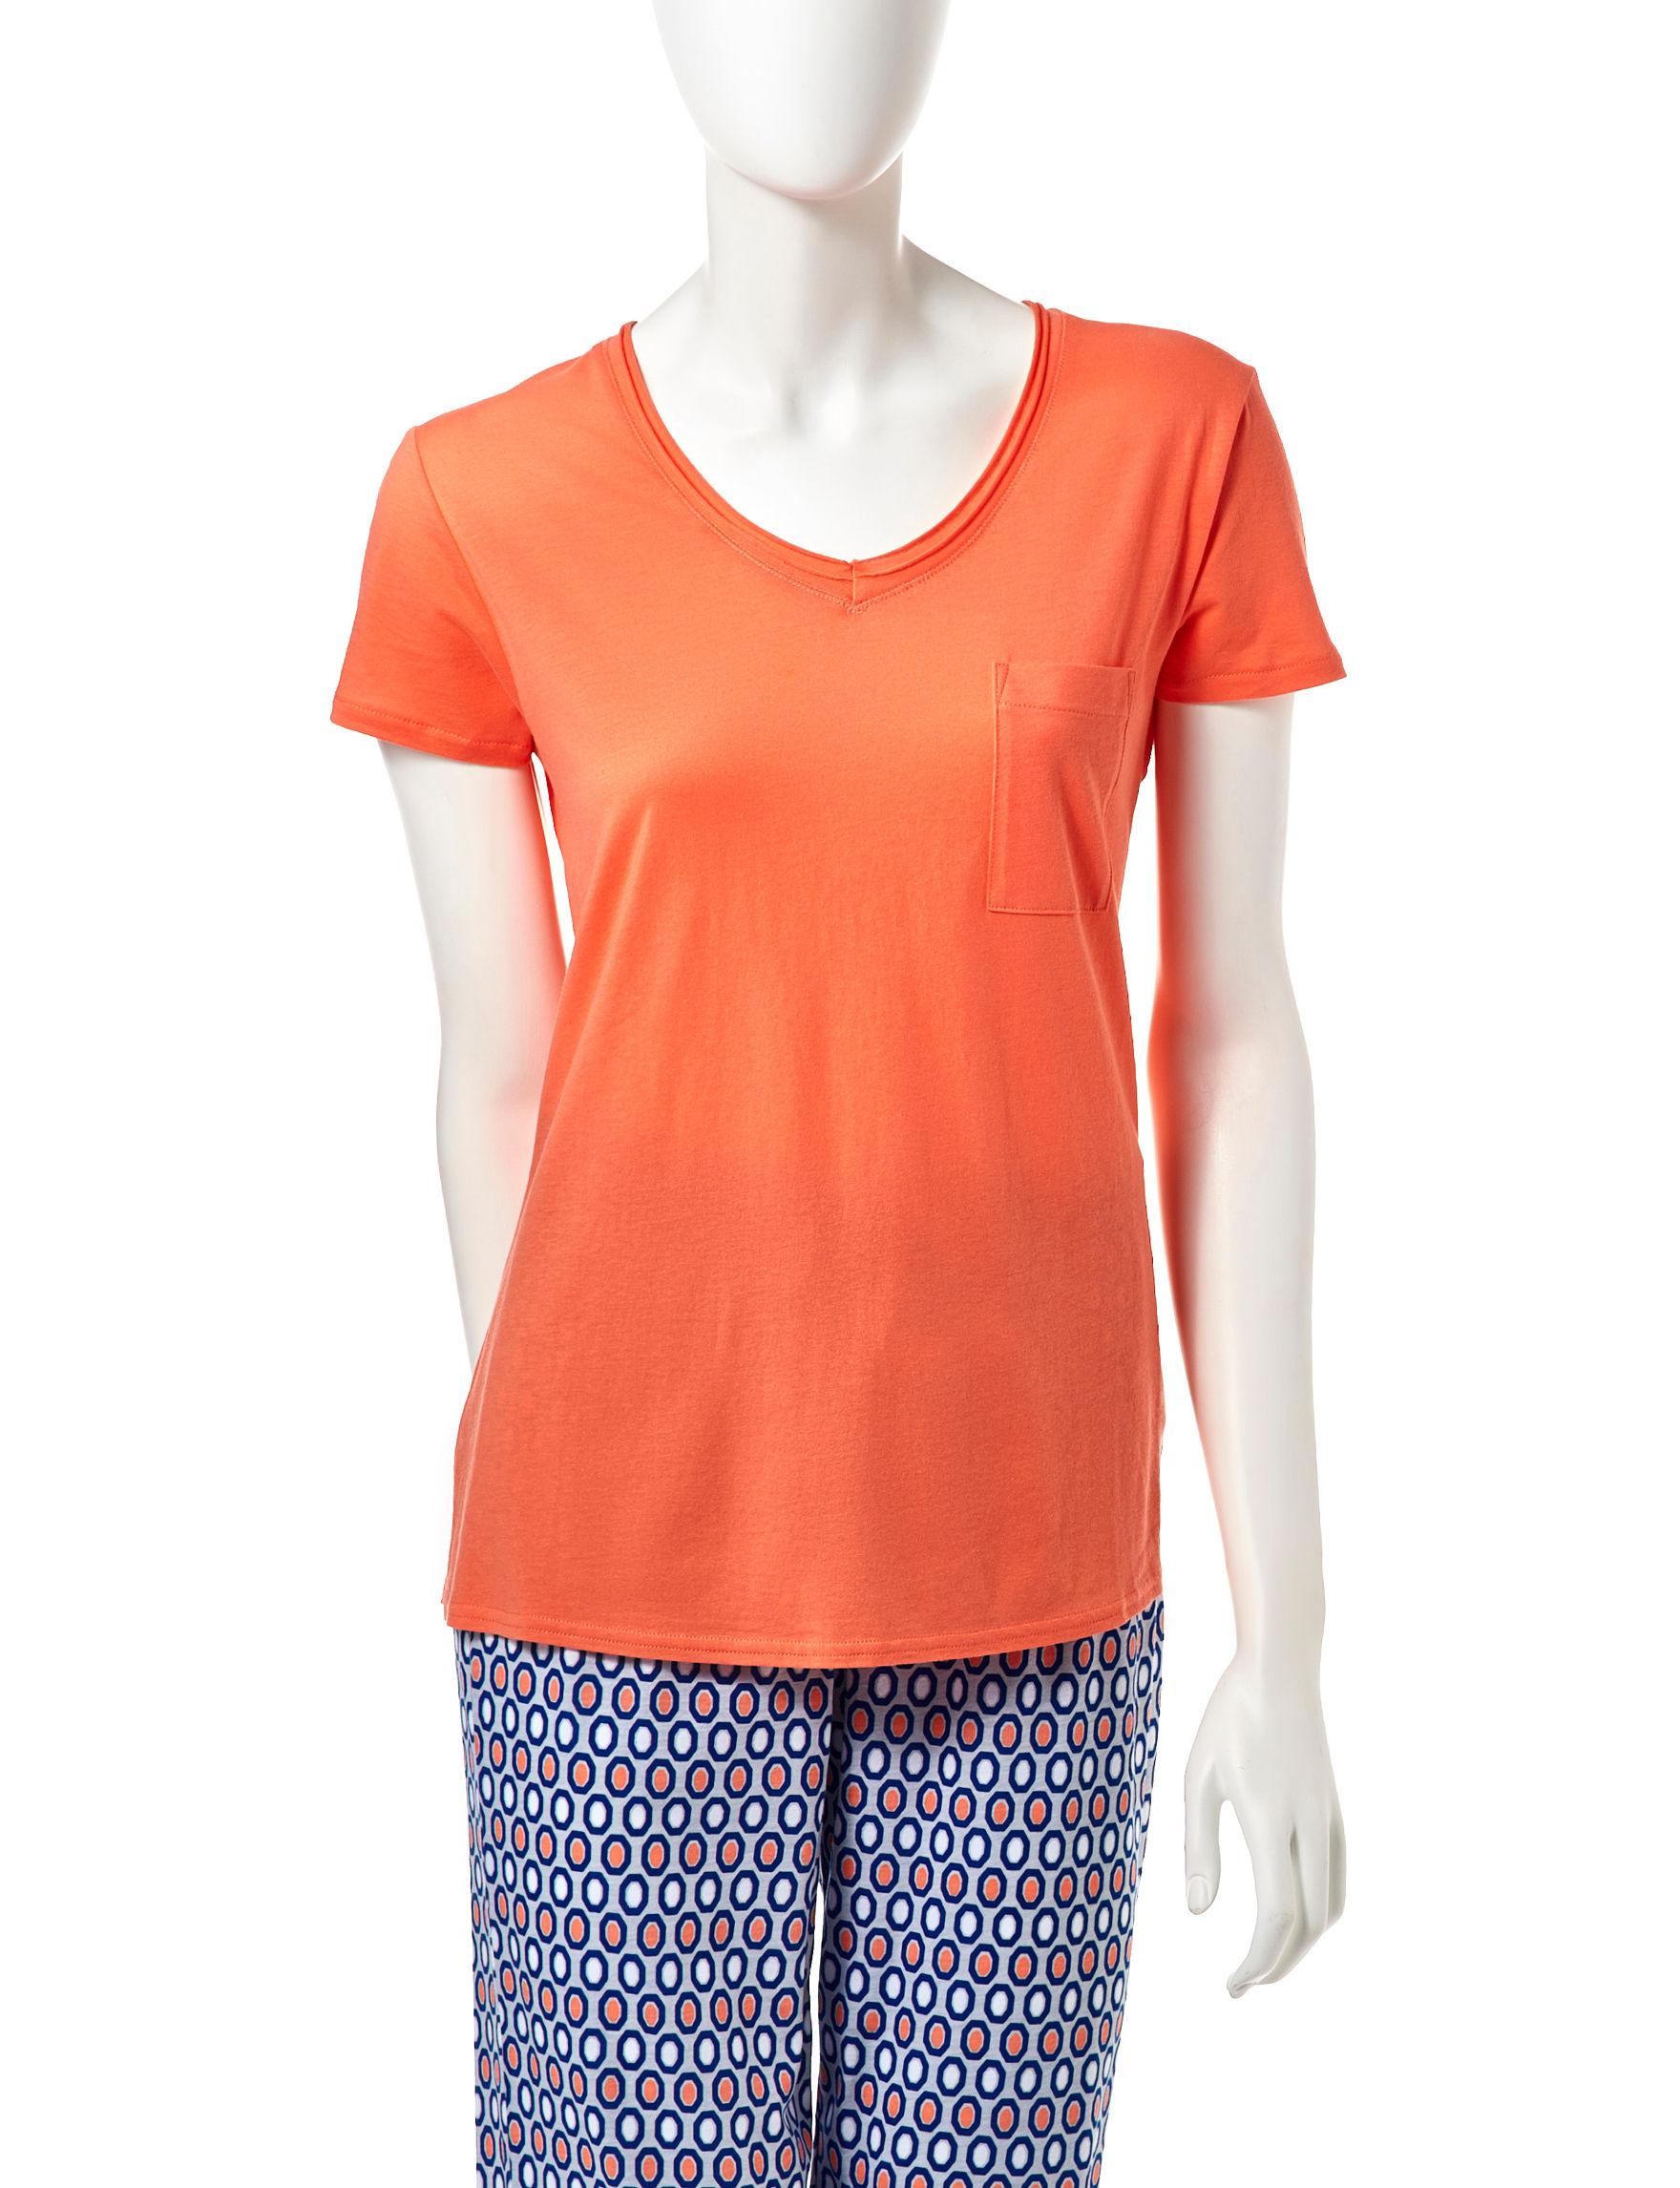 Goodnight Kiss Orange Pajama Tops